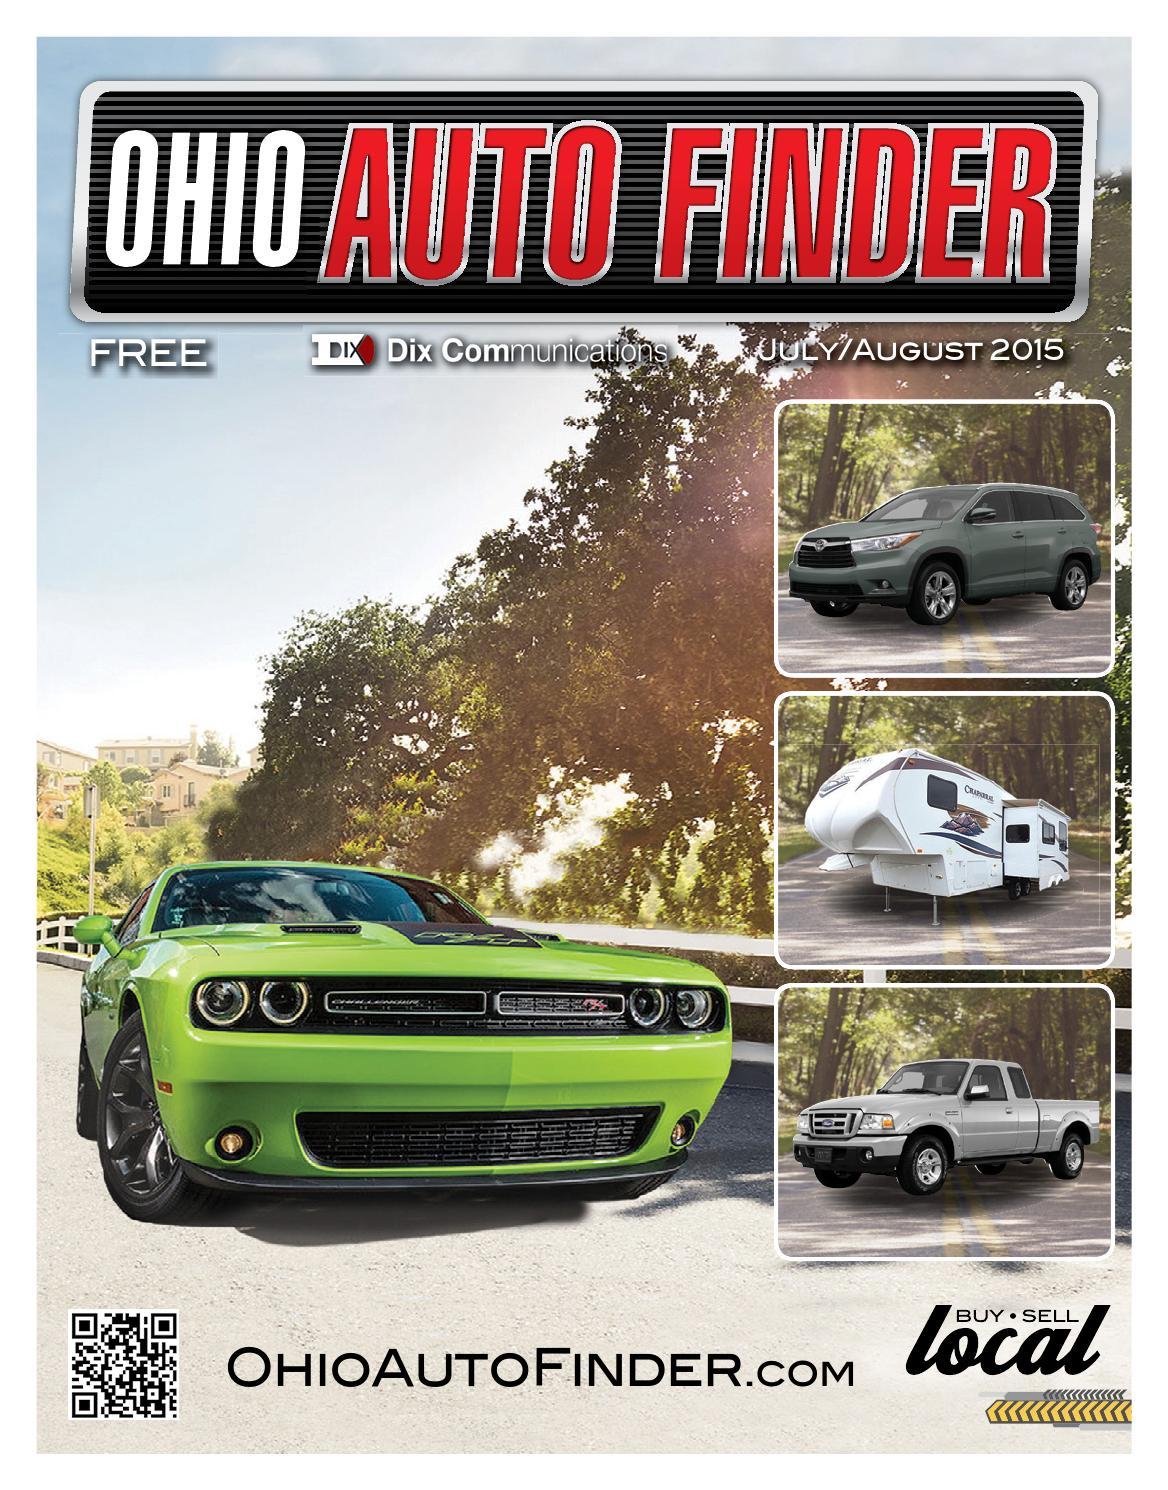 Chuck Nicholson Gmc >> Ohio Auto Finder - July/August 2015 by GateHouse Media NEO ...